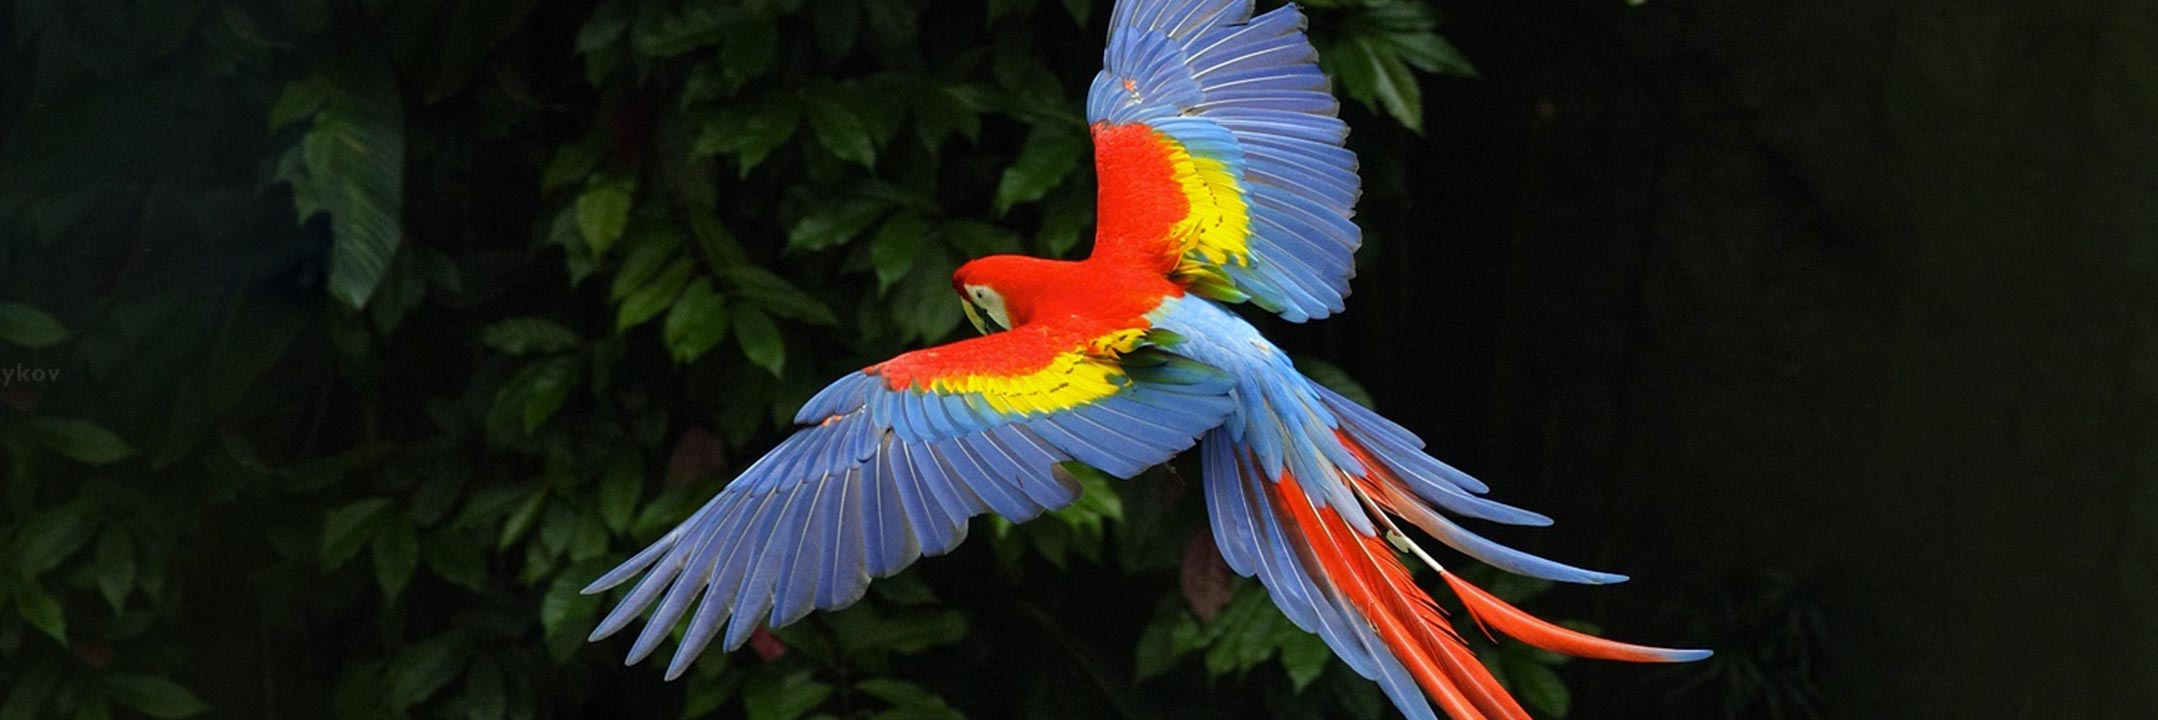 birds04